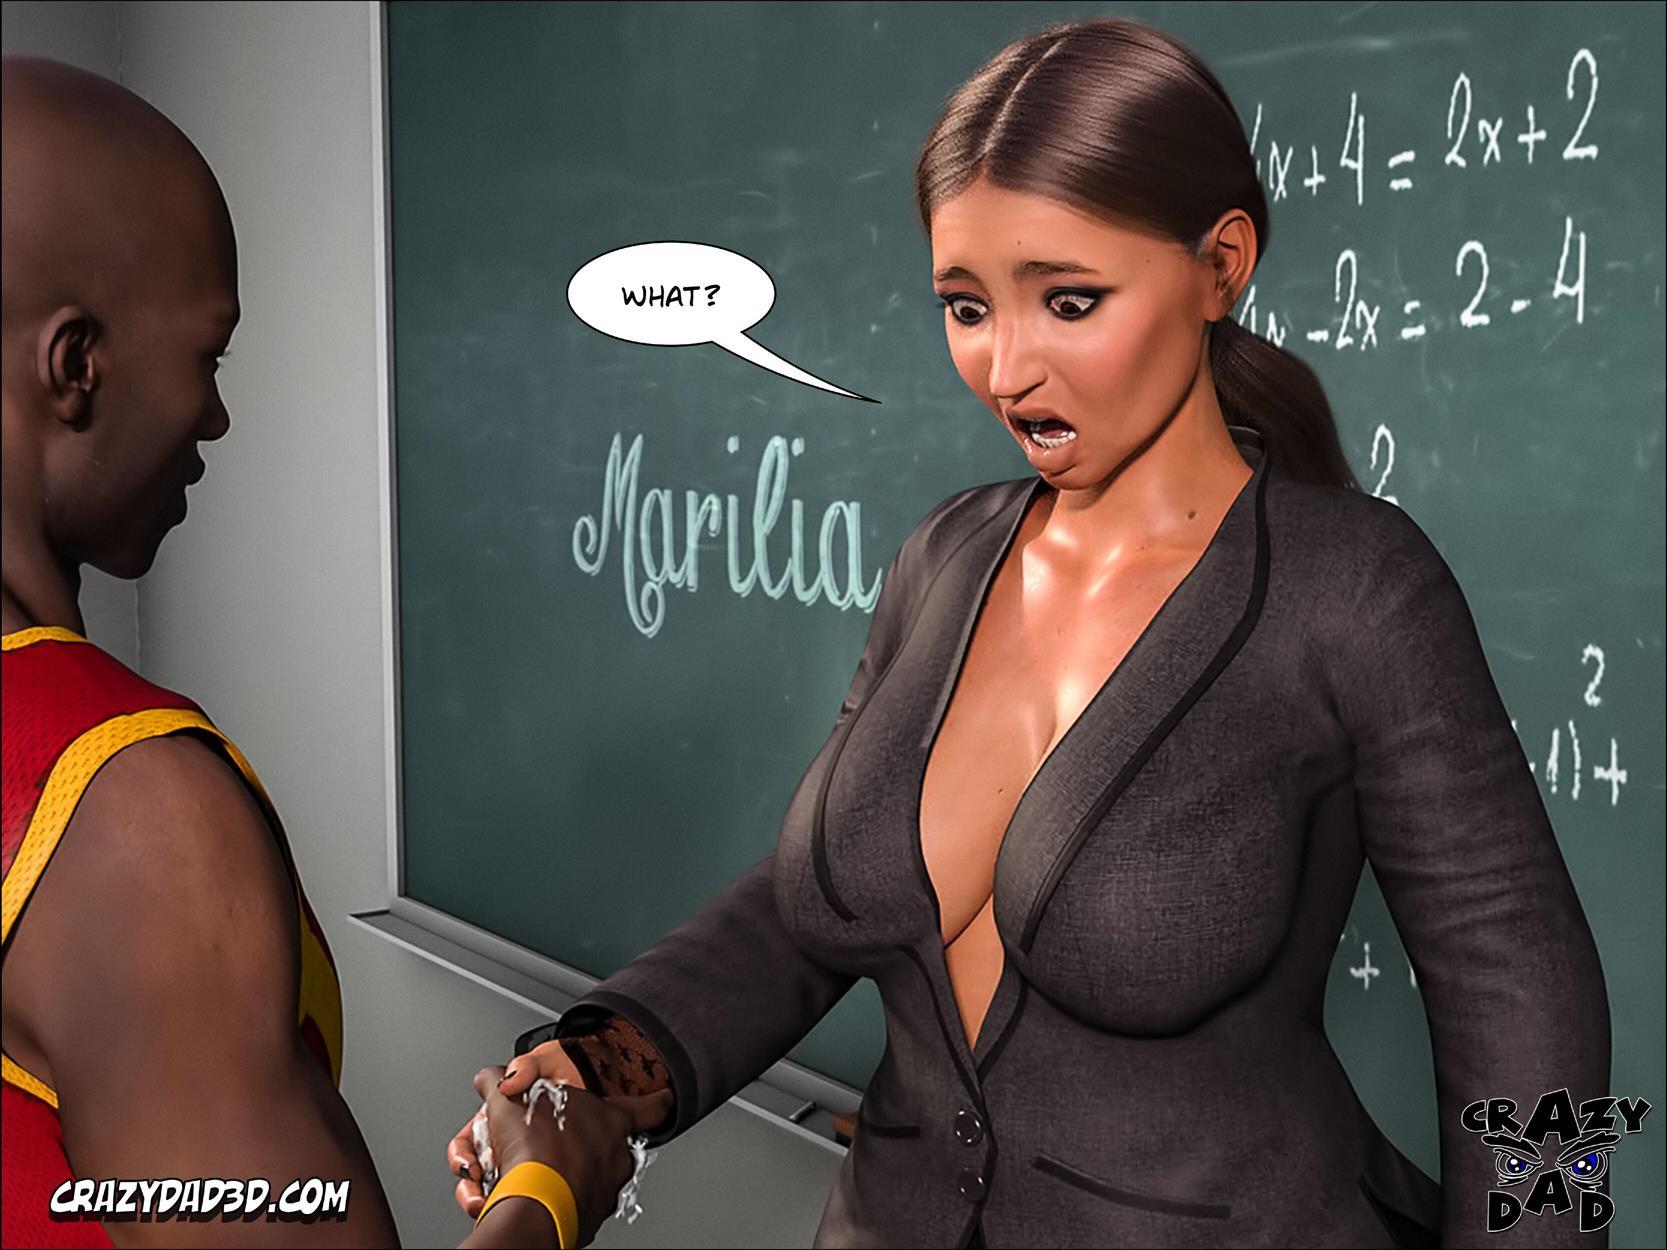 Spank 2 -Teacher Marilia [Crazy Dad 3D] - Foto 38